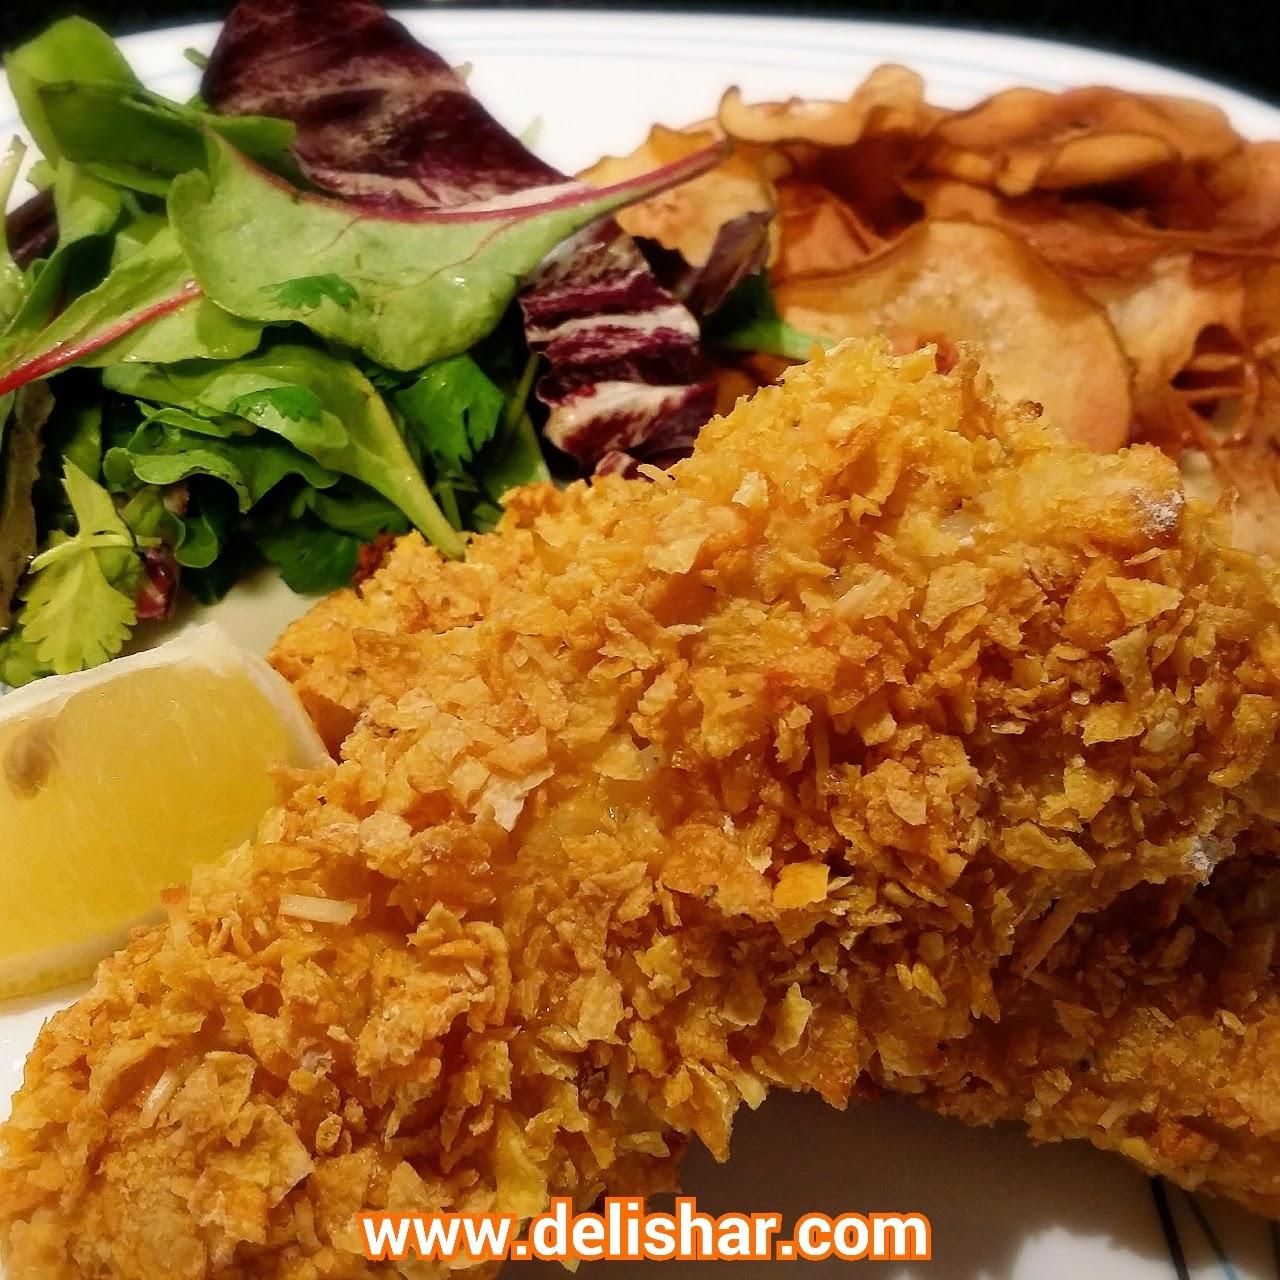 Delishar crispy cornflake baked fish for Crispy oven baked fish